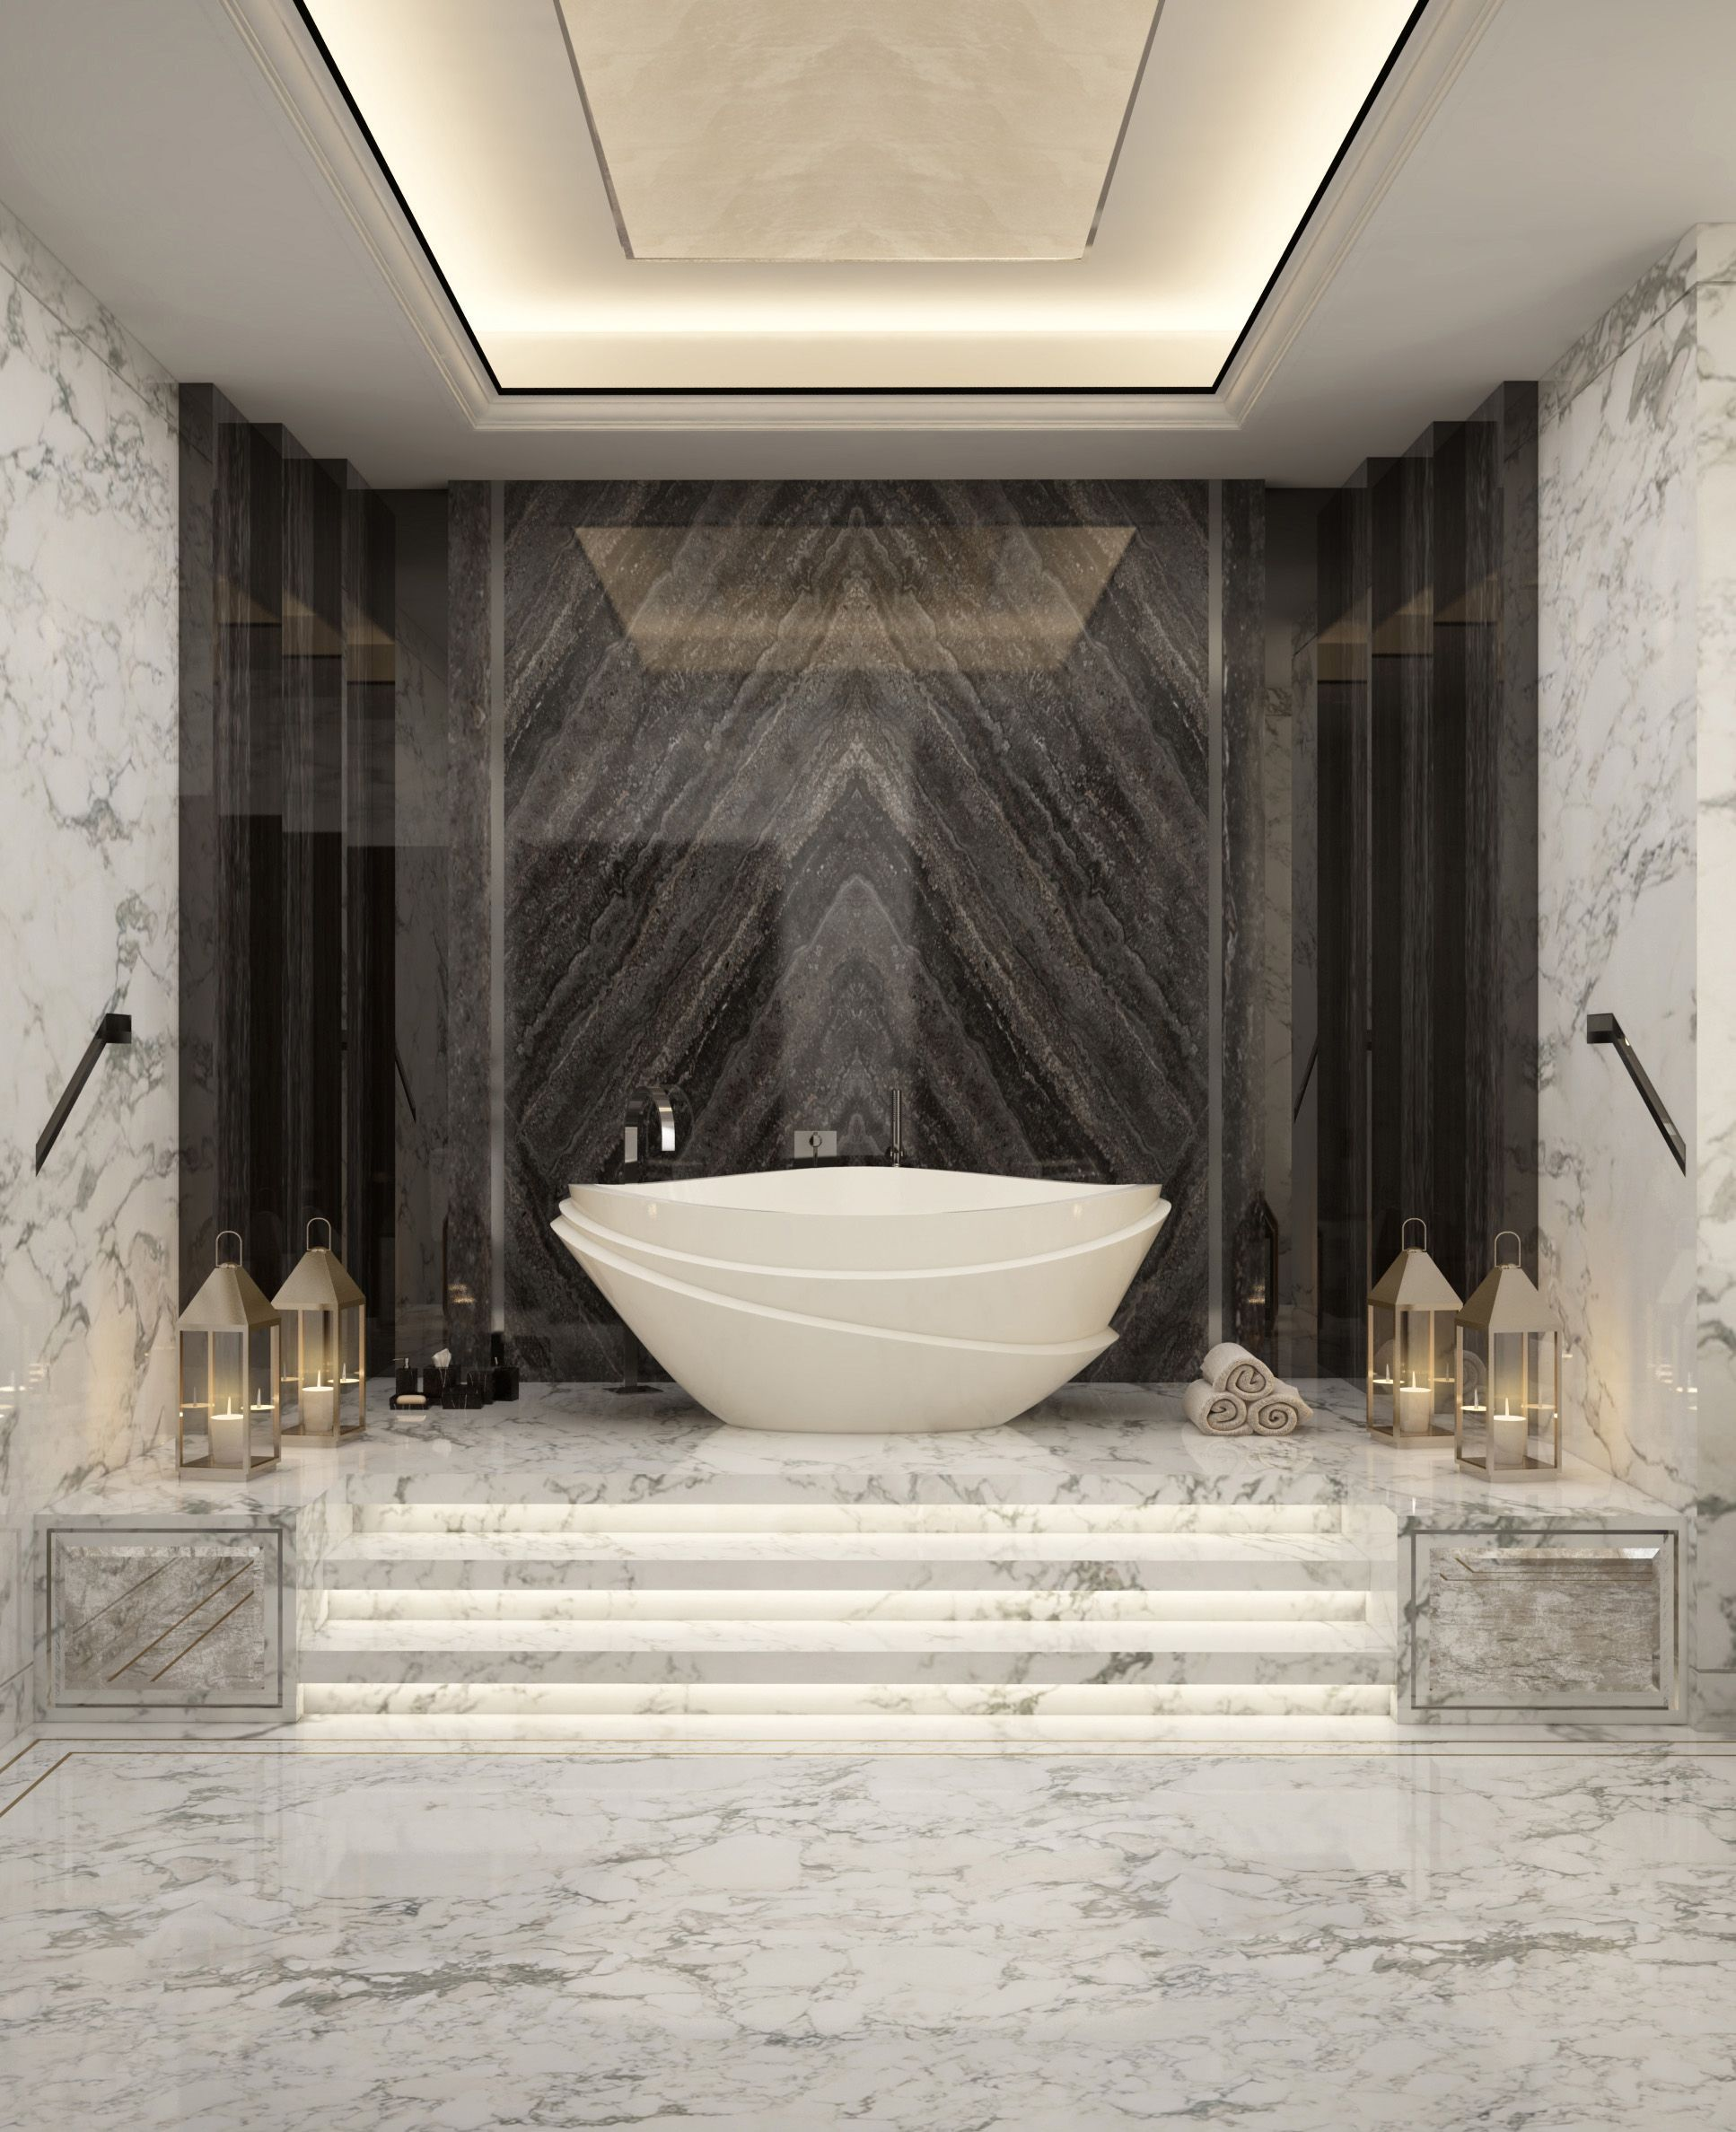 Luxury Design Motor Yachts Master Bedroom Luxury Design Mandala Luxury Design Lu Modern Luxury Bathroom Luxury Bathroom Master Baths Bathroom Design Luxury